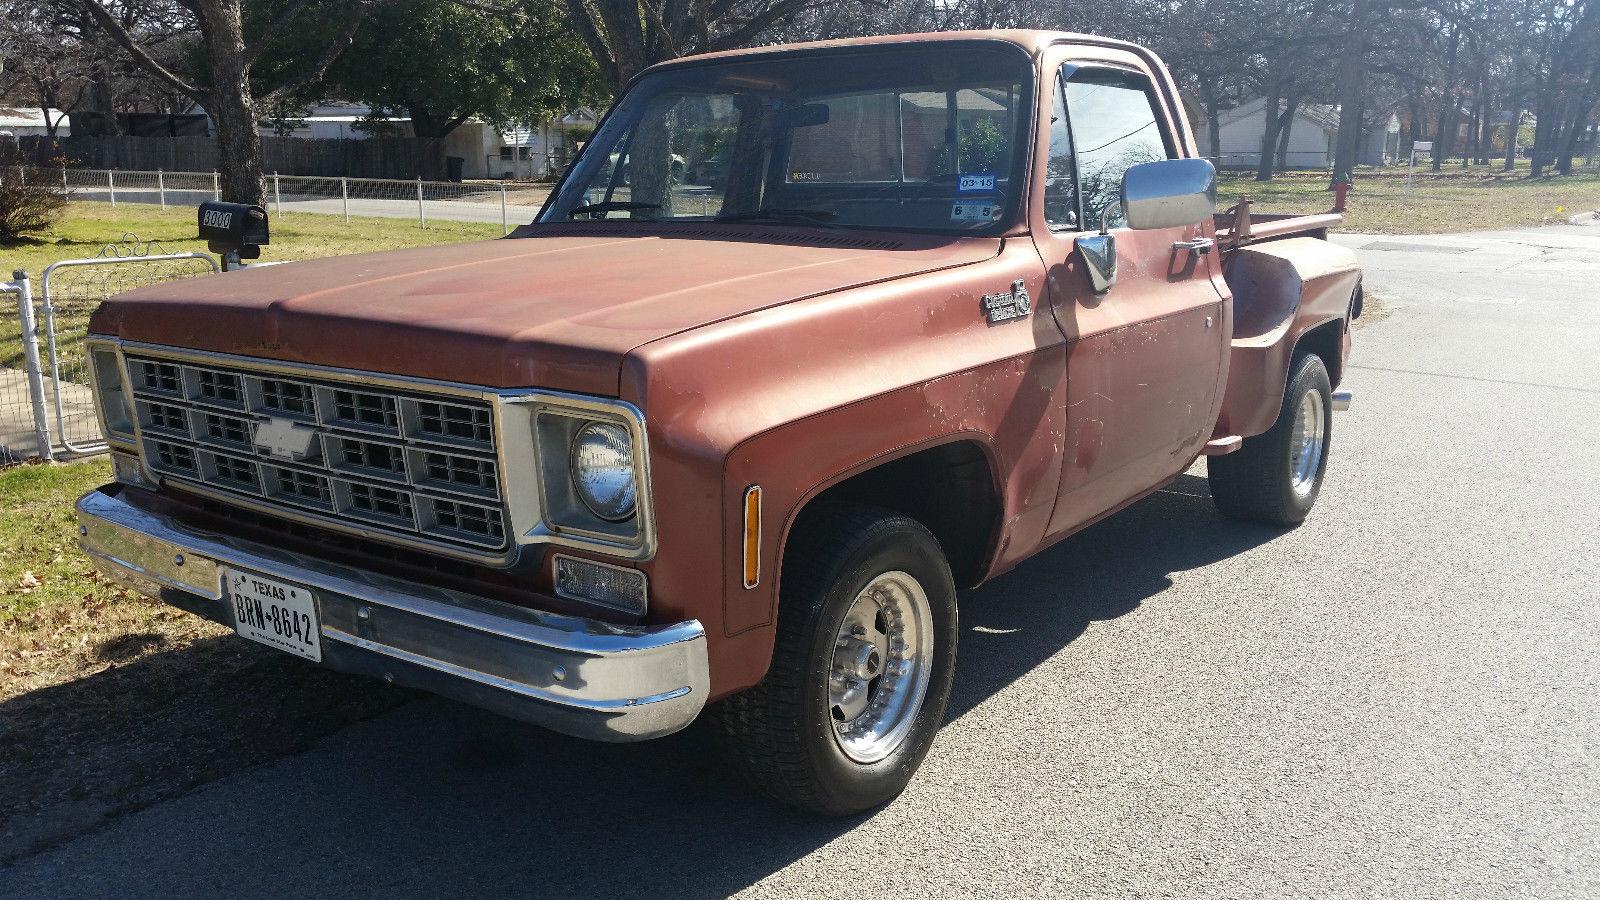 1977 chevy swb stepside pickup truck for sale in haltom city texas united states. Black Bedroom Furniture Sets. Home Design Ideas